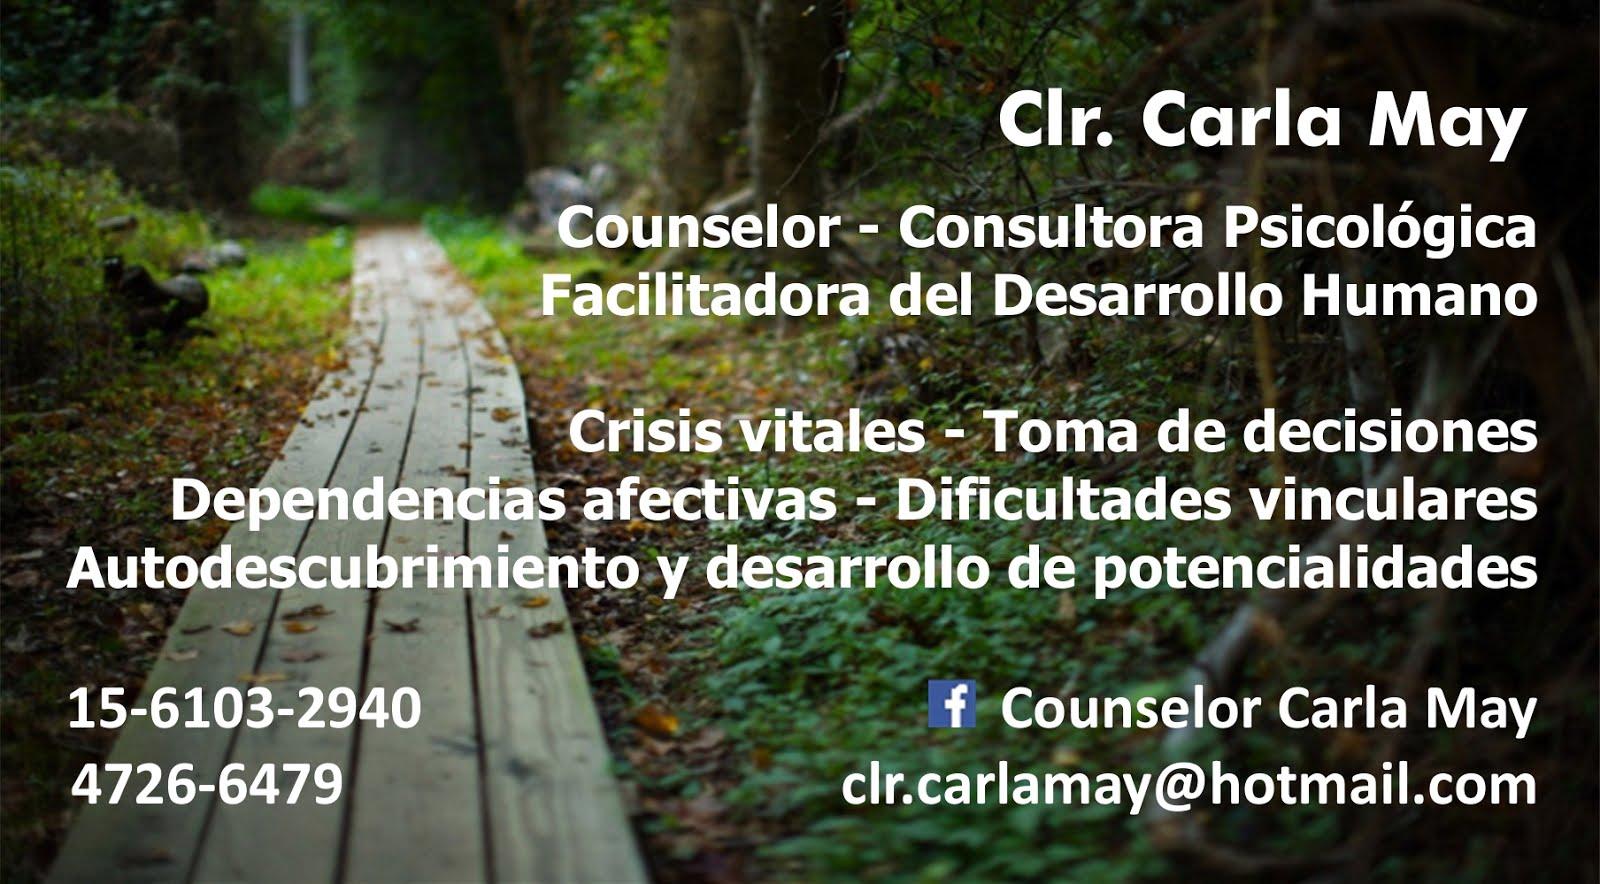 Carla May, Consultora Psicológica